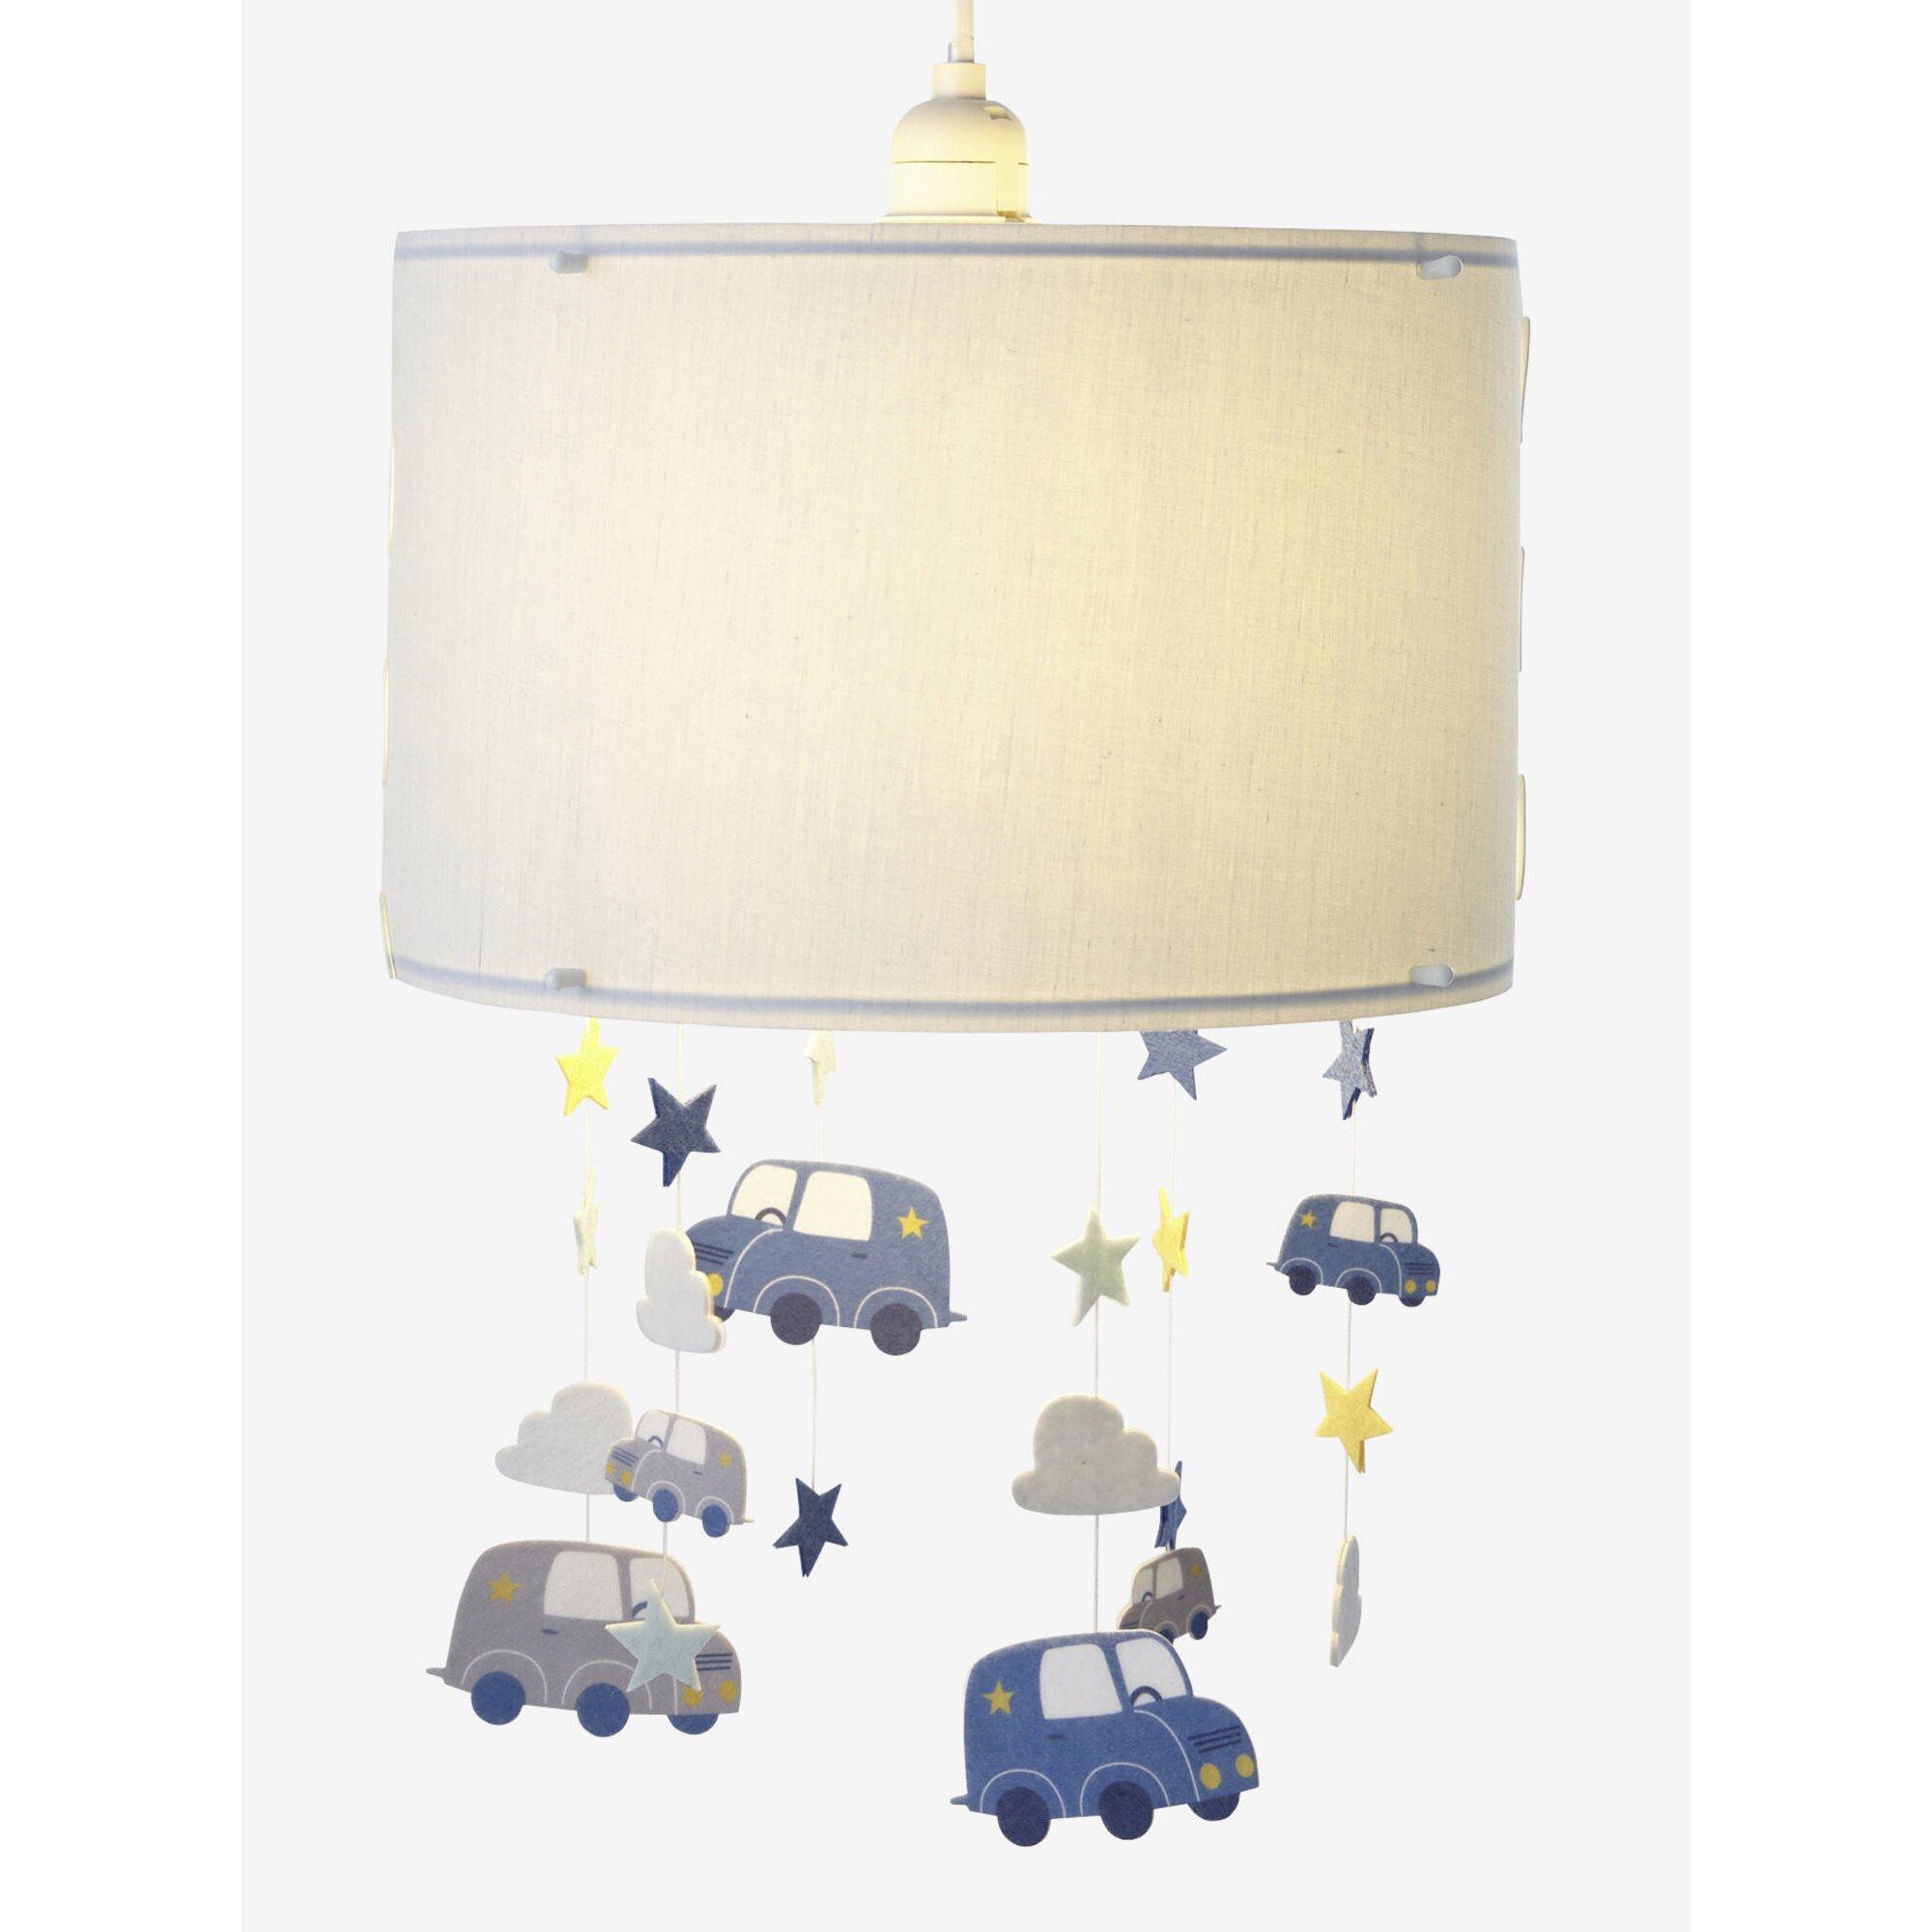 vertbaudet-hange-lampenschirm-fur-kinderzimmer-autos